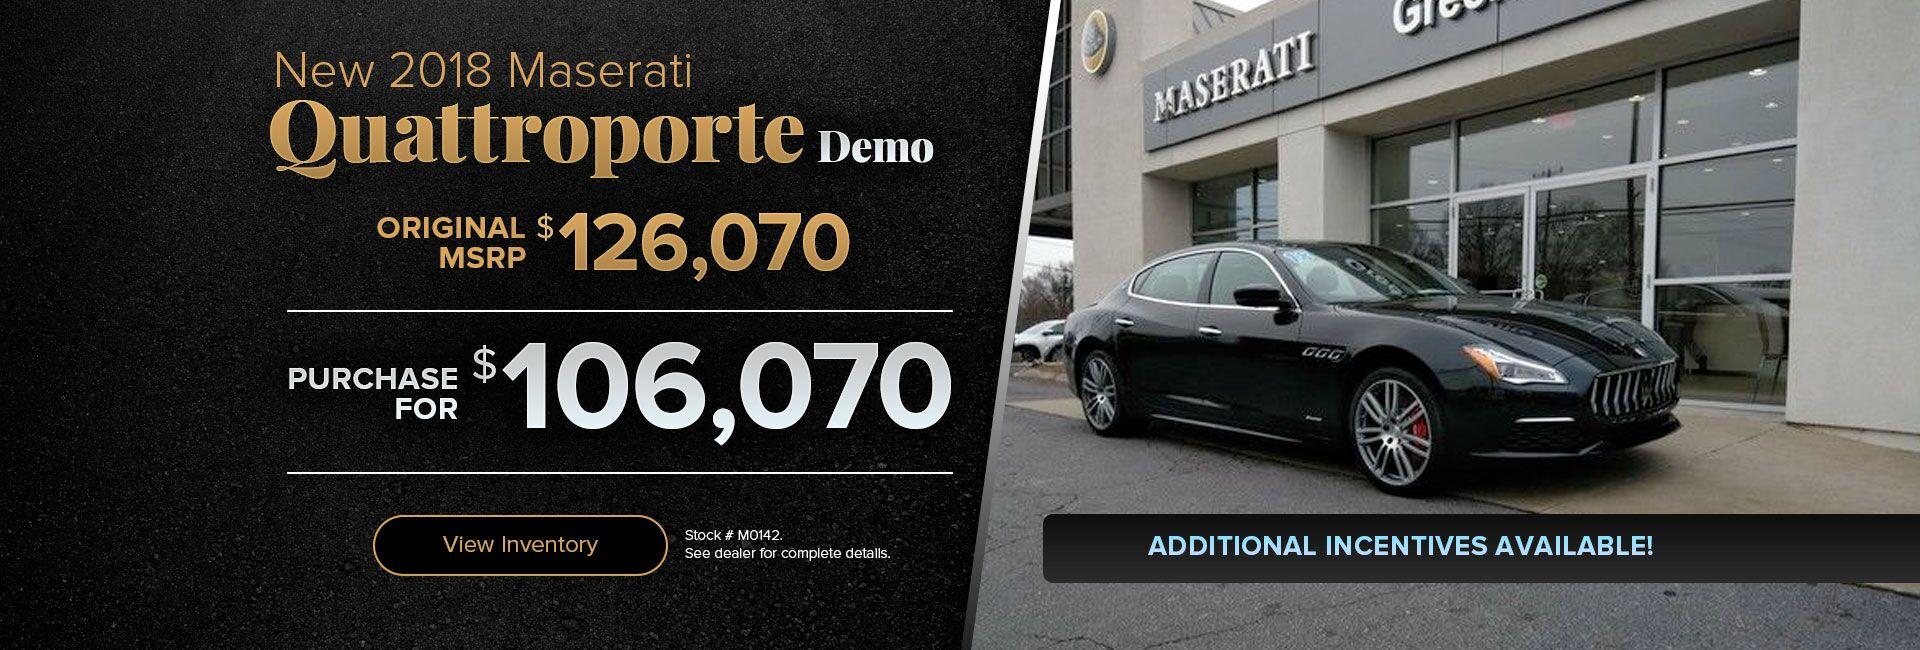 Used Cars Greenville Sc >> Maserati And Lotus Dealership Greenville Sc Used Cars Maserati